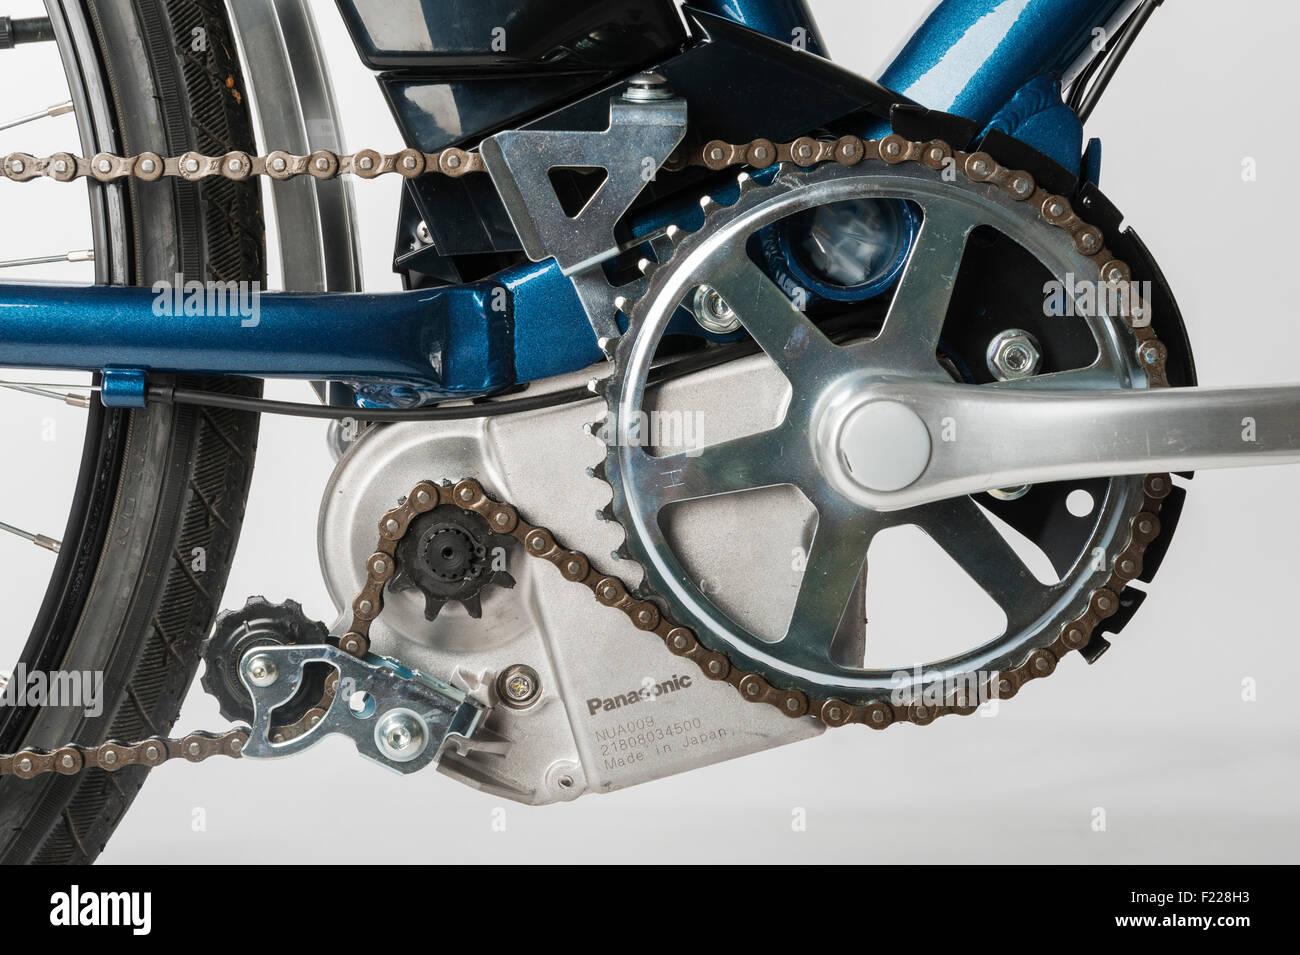 e motion electric bike detail of the panasonic motor on. Black Bedroom Furniture Sets. Home Design Ideas